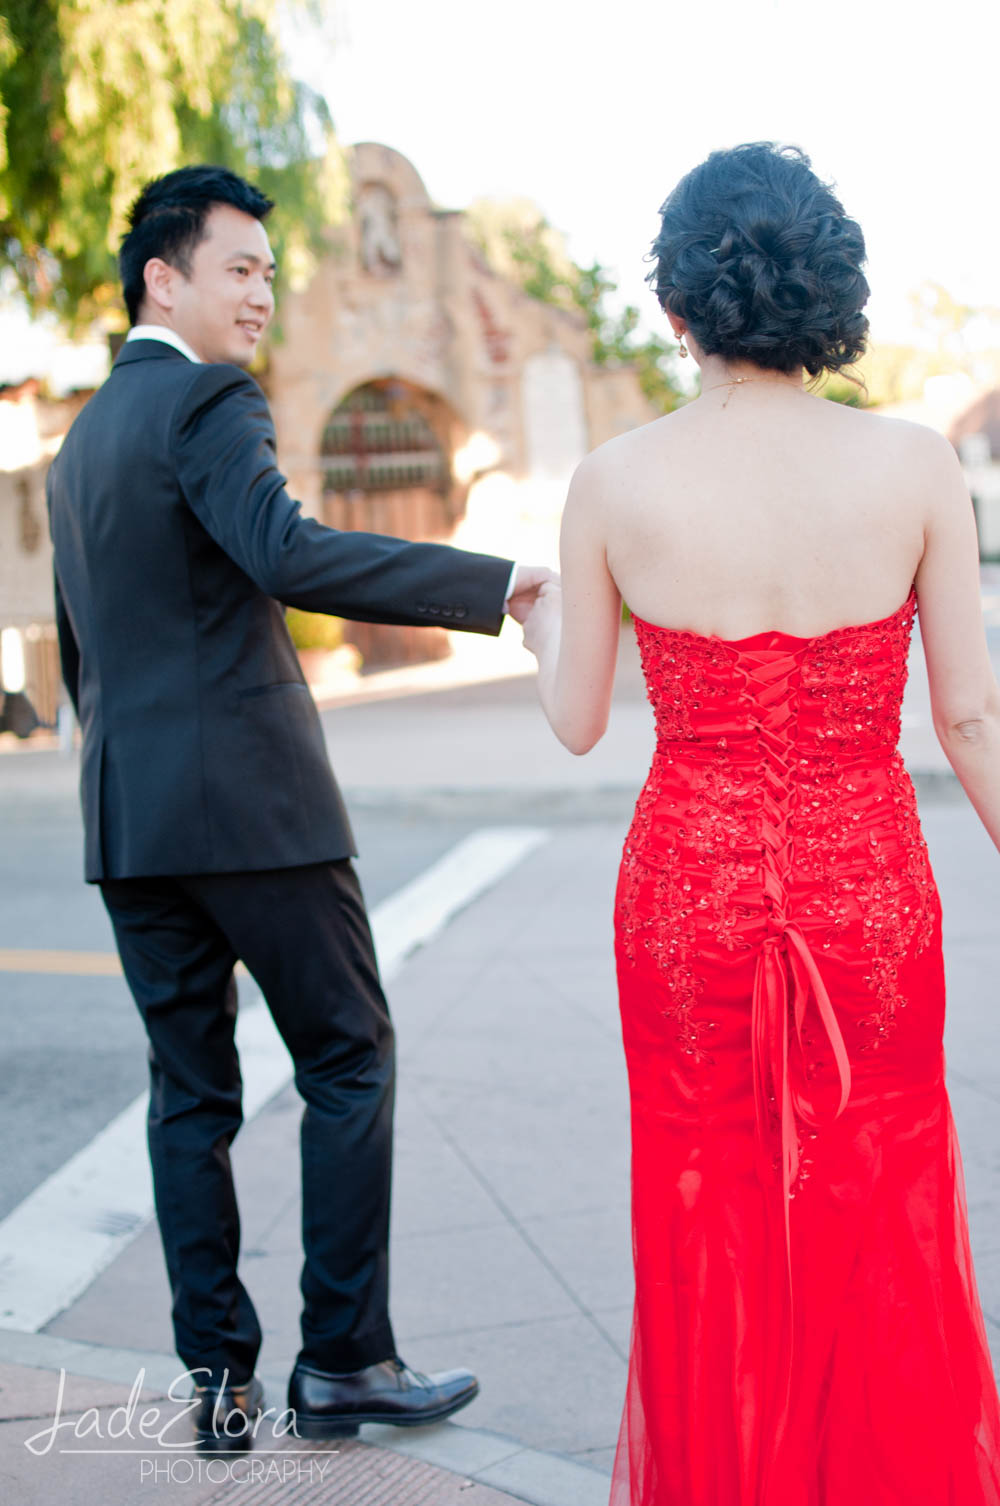 JadeEloraPhotography-Blog-Engagement-Weddings-39.jpg